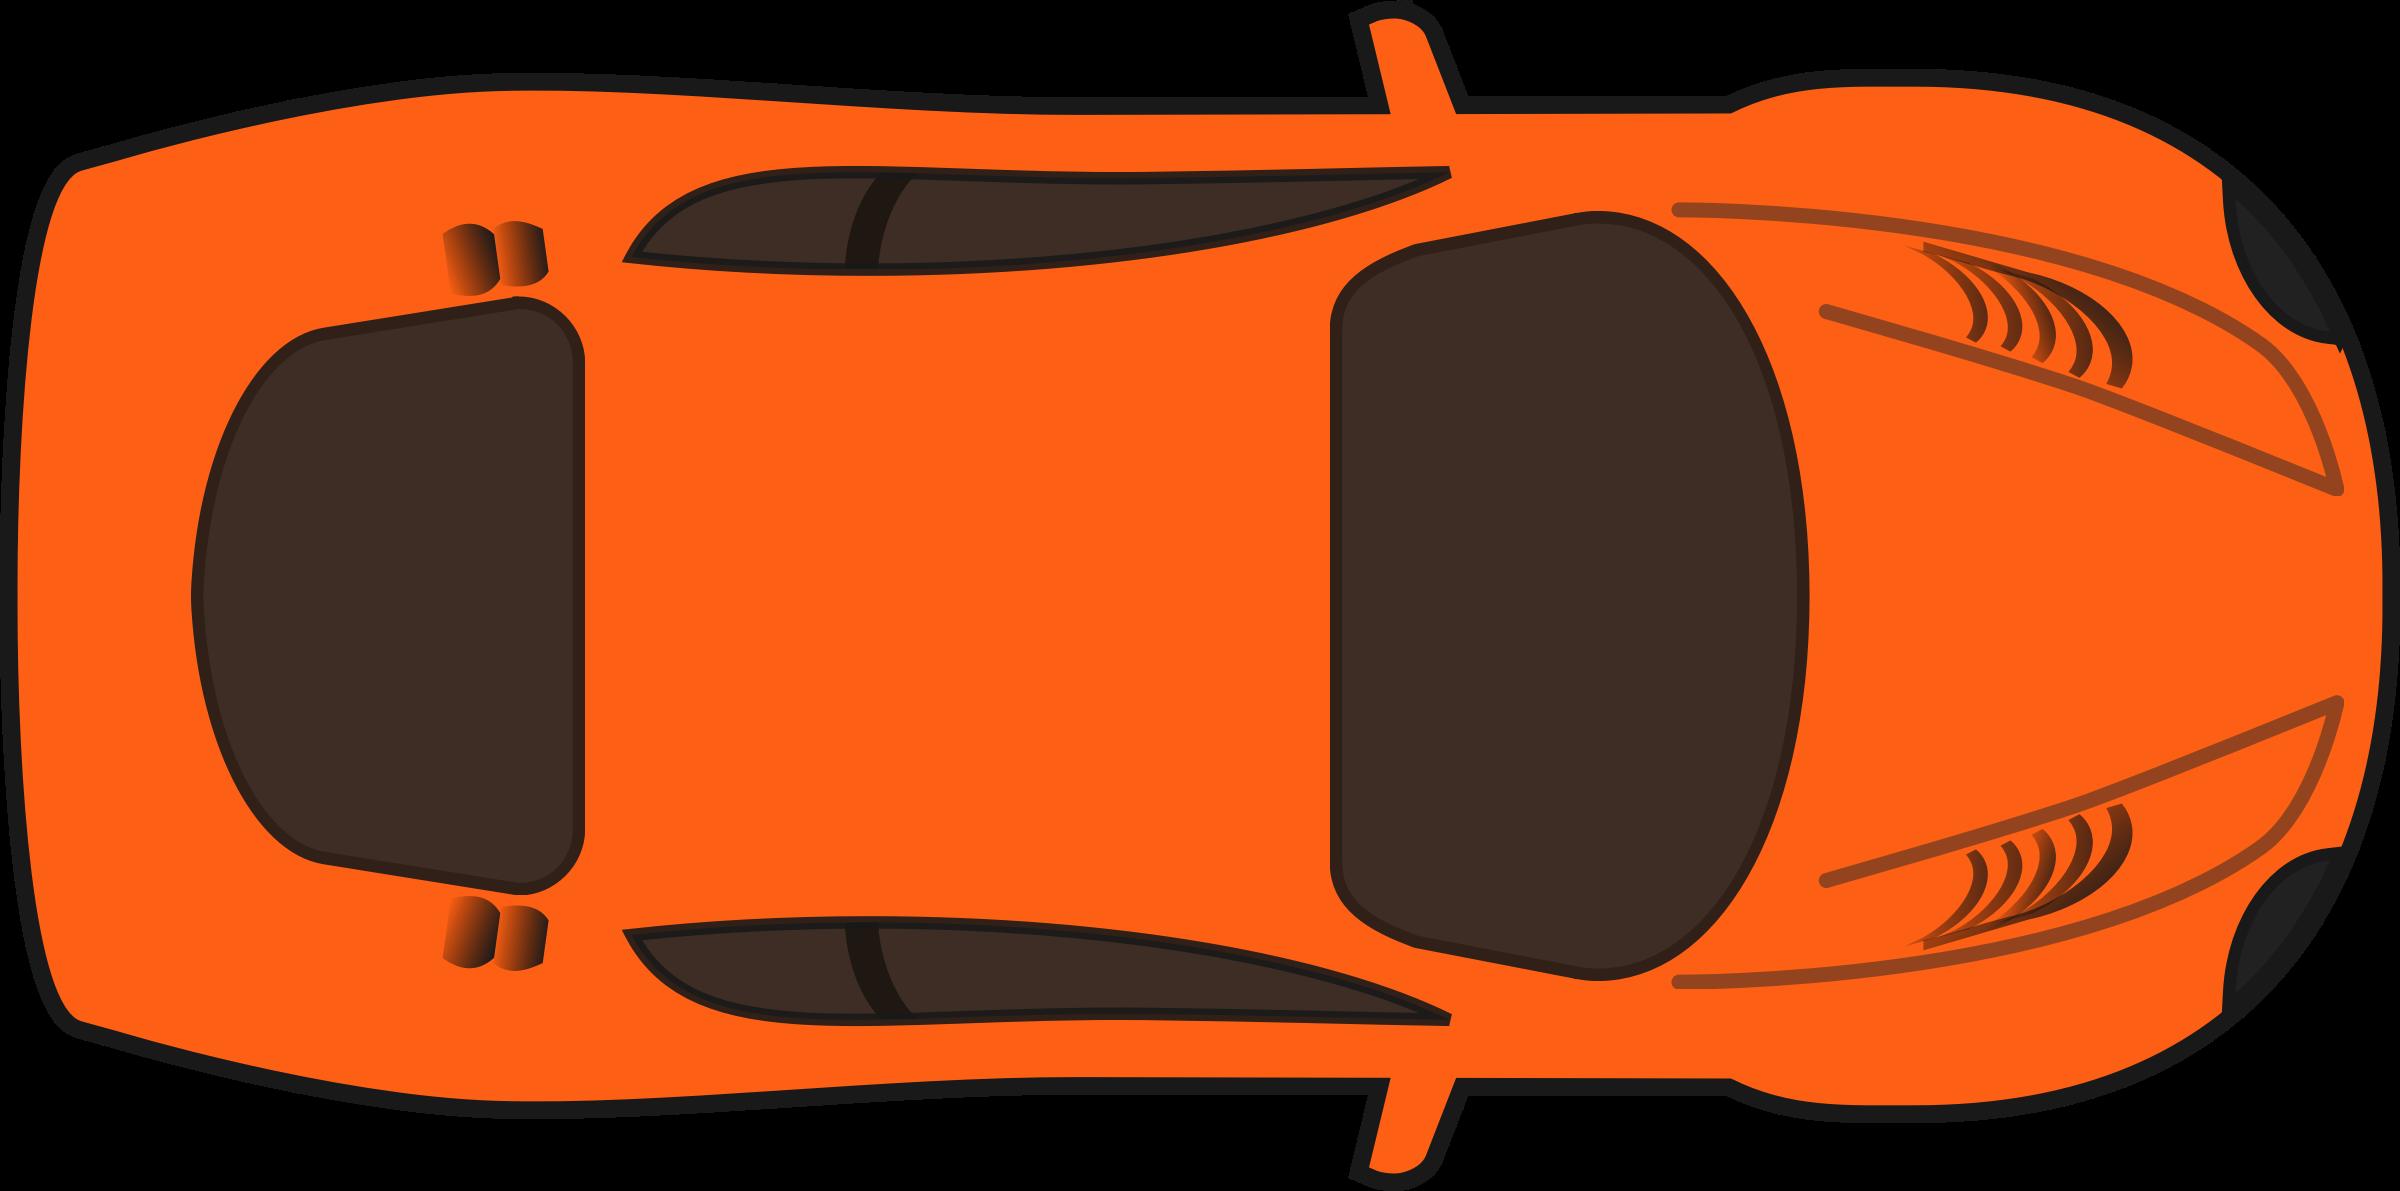 Car clipart plan view vector Free Overhead Car Cliparts, Download Free Clip Art, Free Clip Art on ... vector